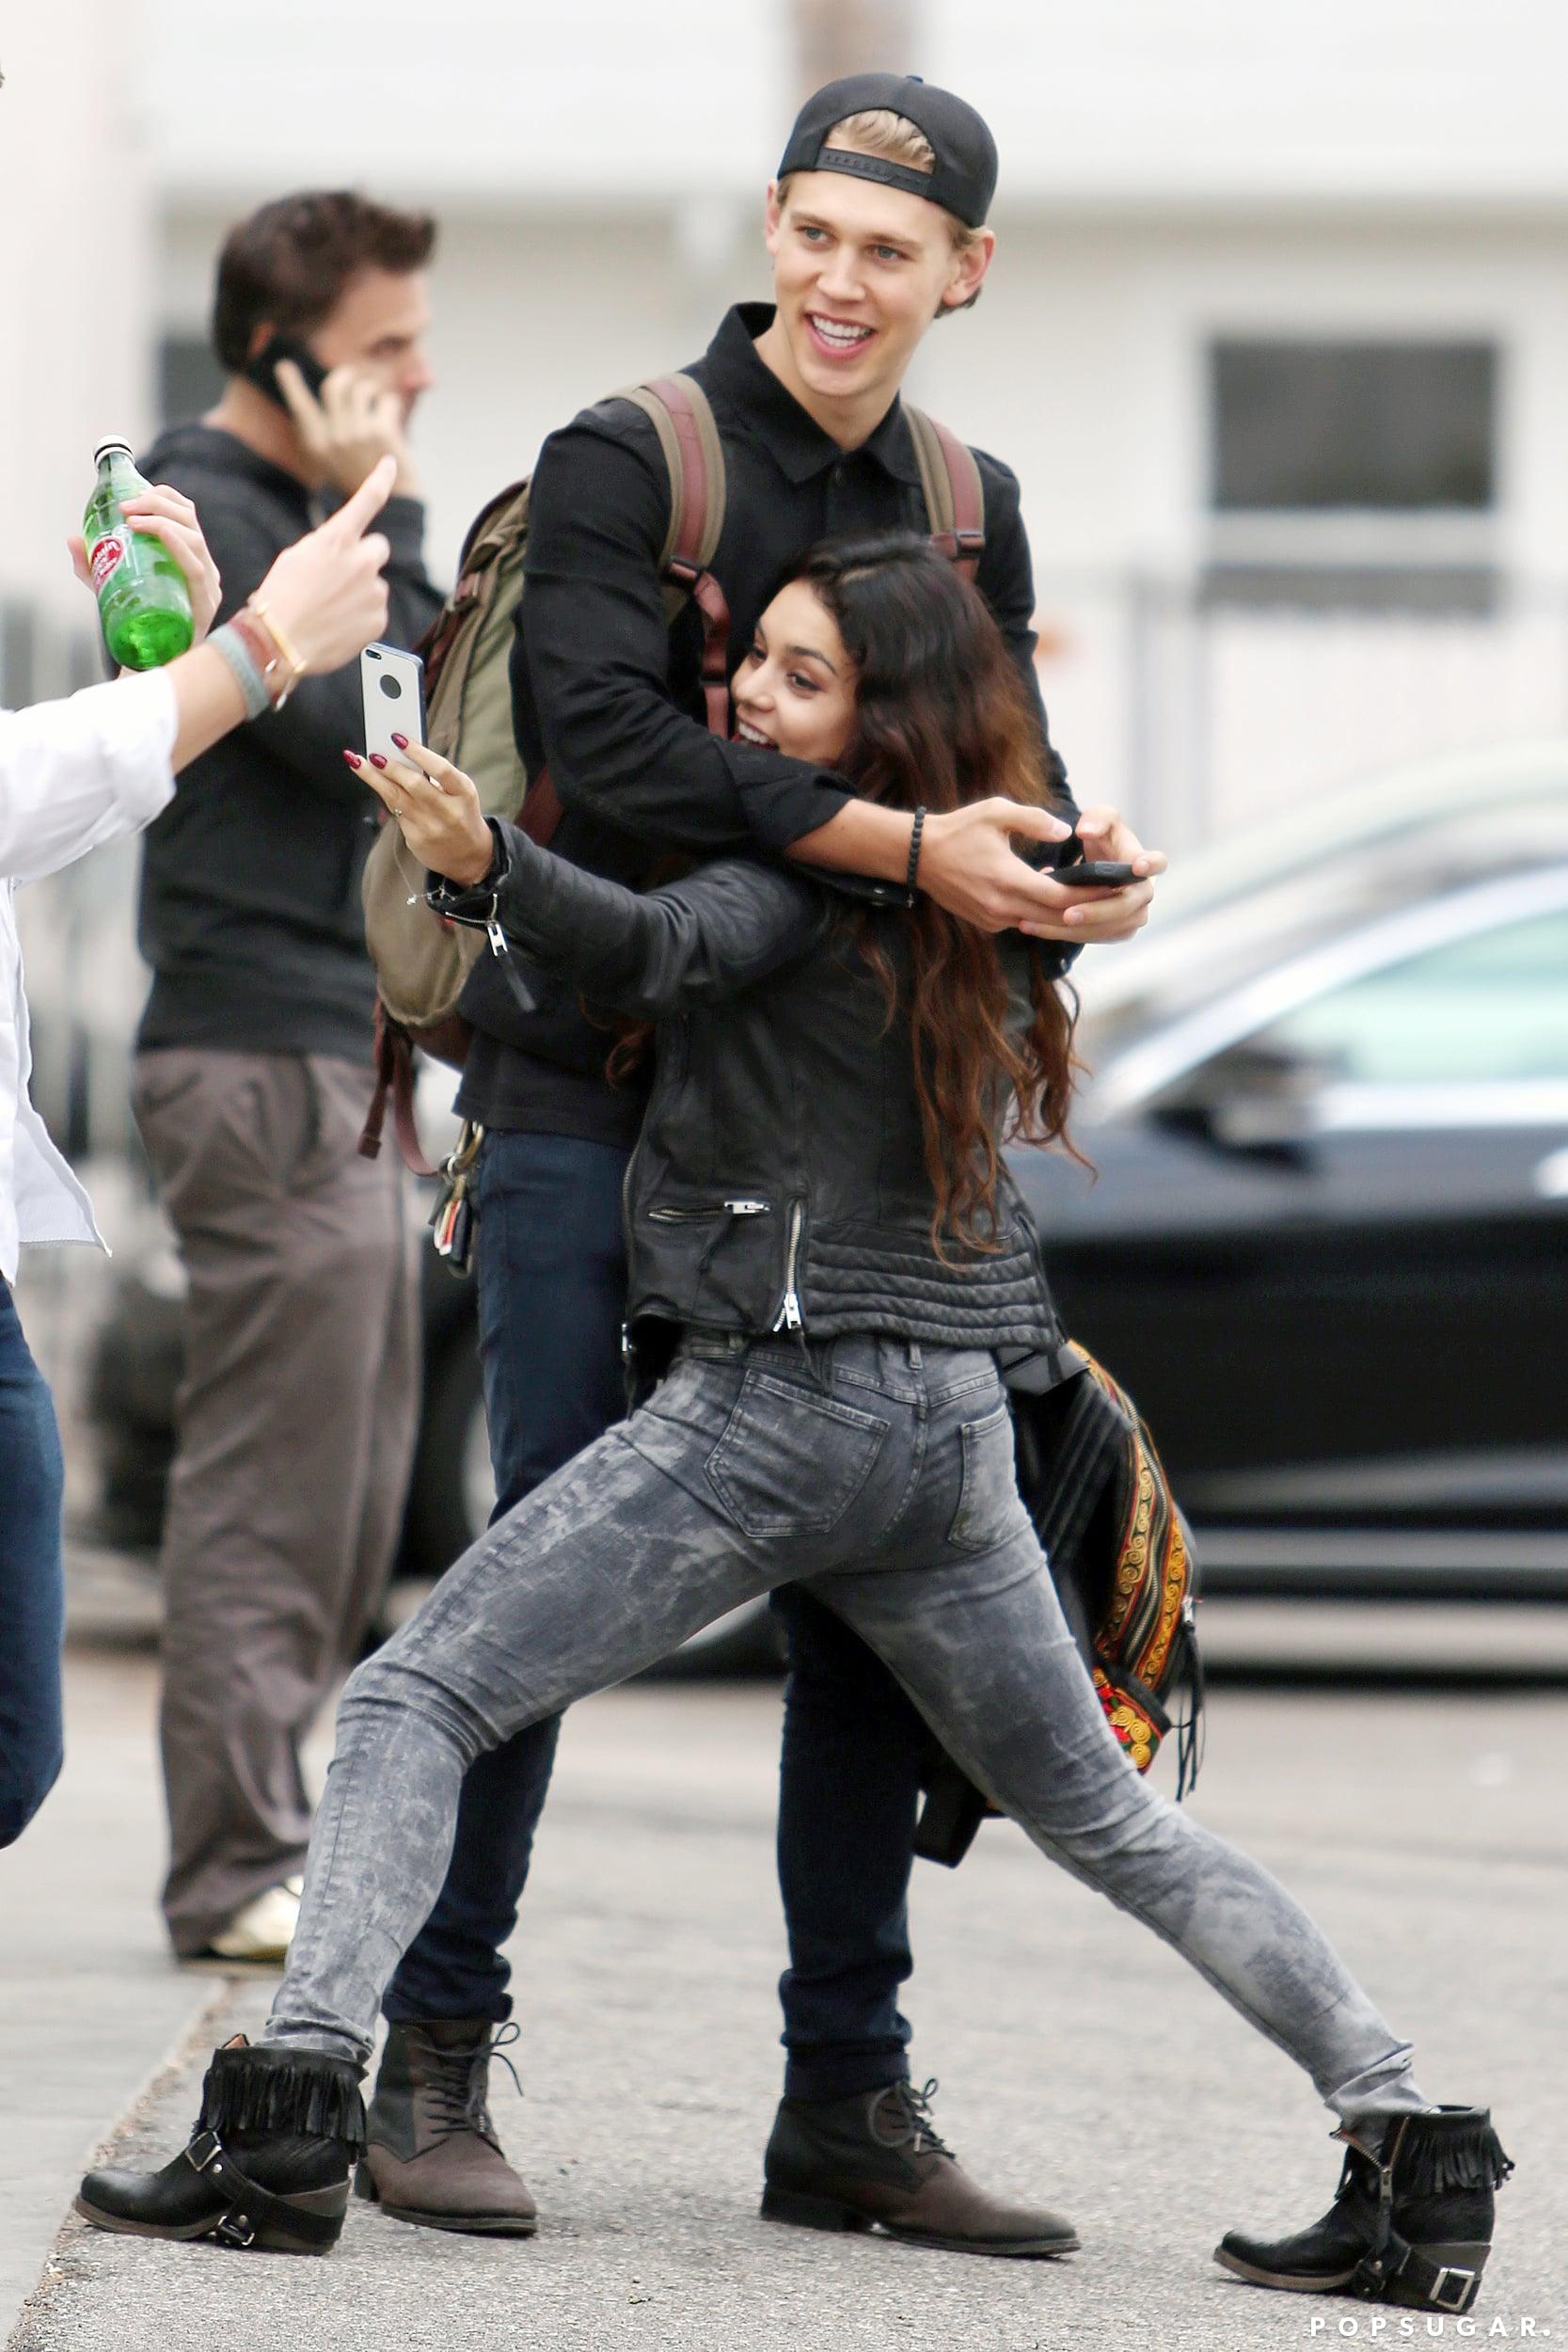 In December 2013, Vanessa Hudgens got silly while taking a selfie with boyfriend Austin Butler in Venice Beach, CA.